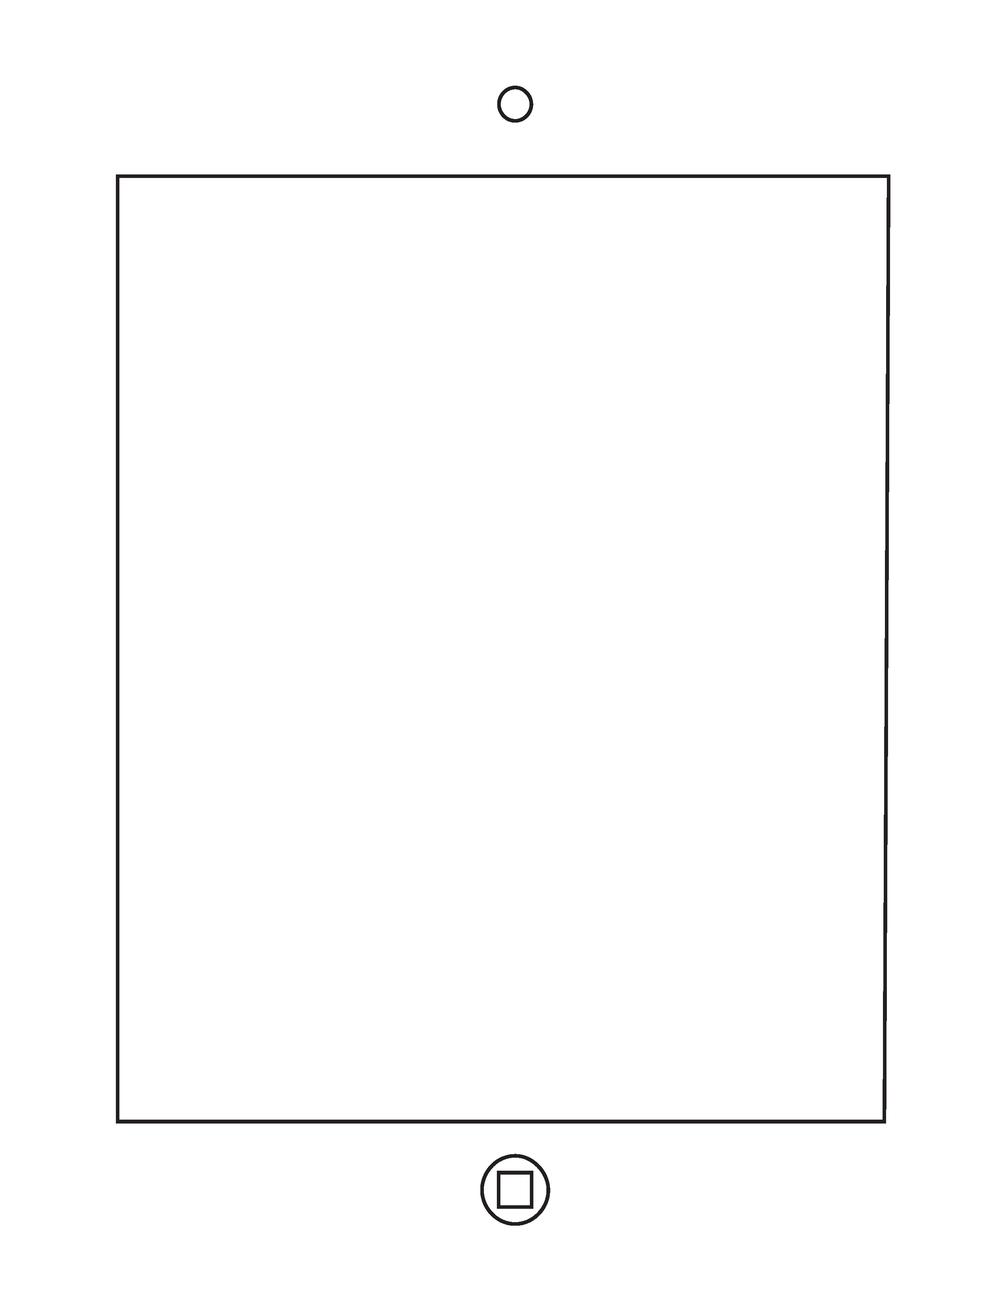 IPad Note Pad